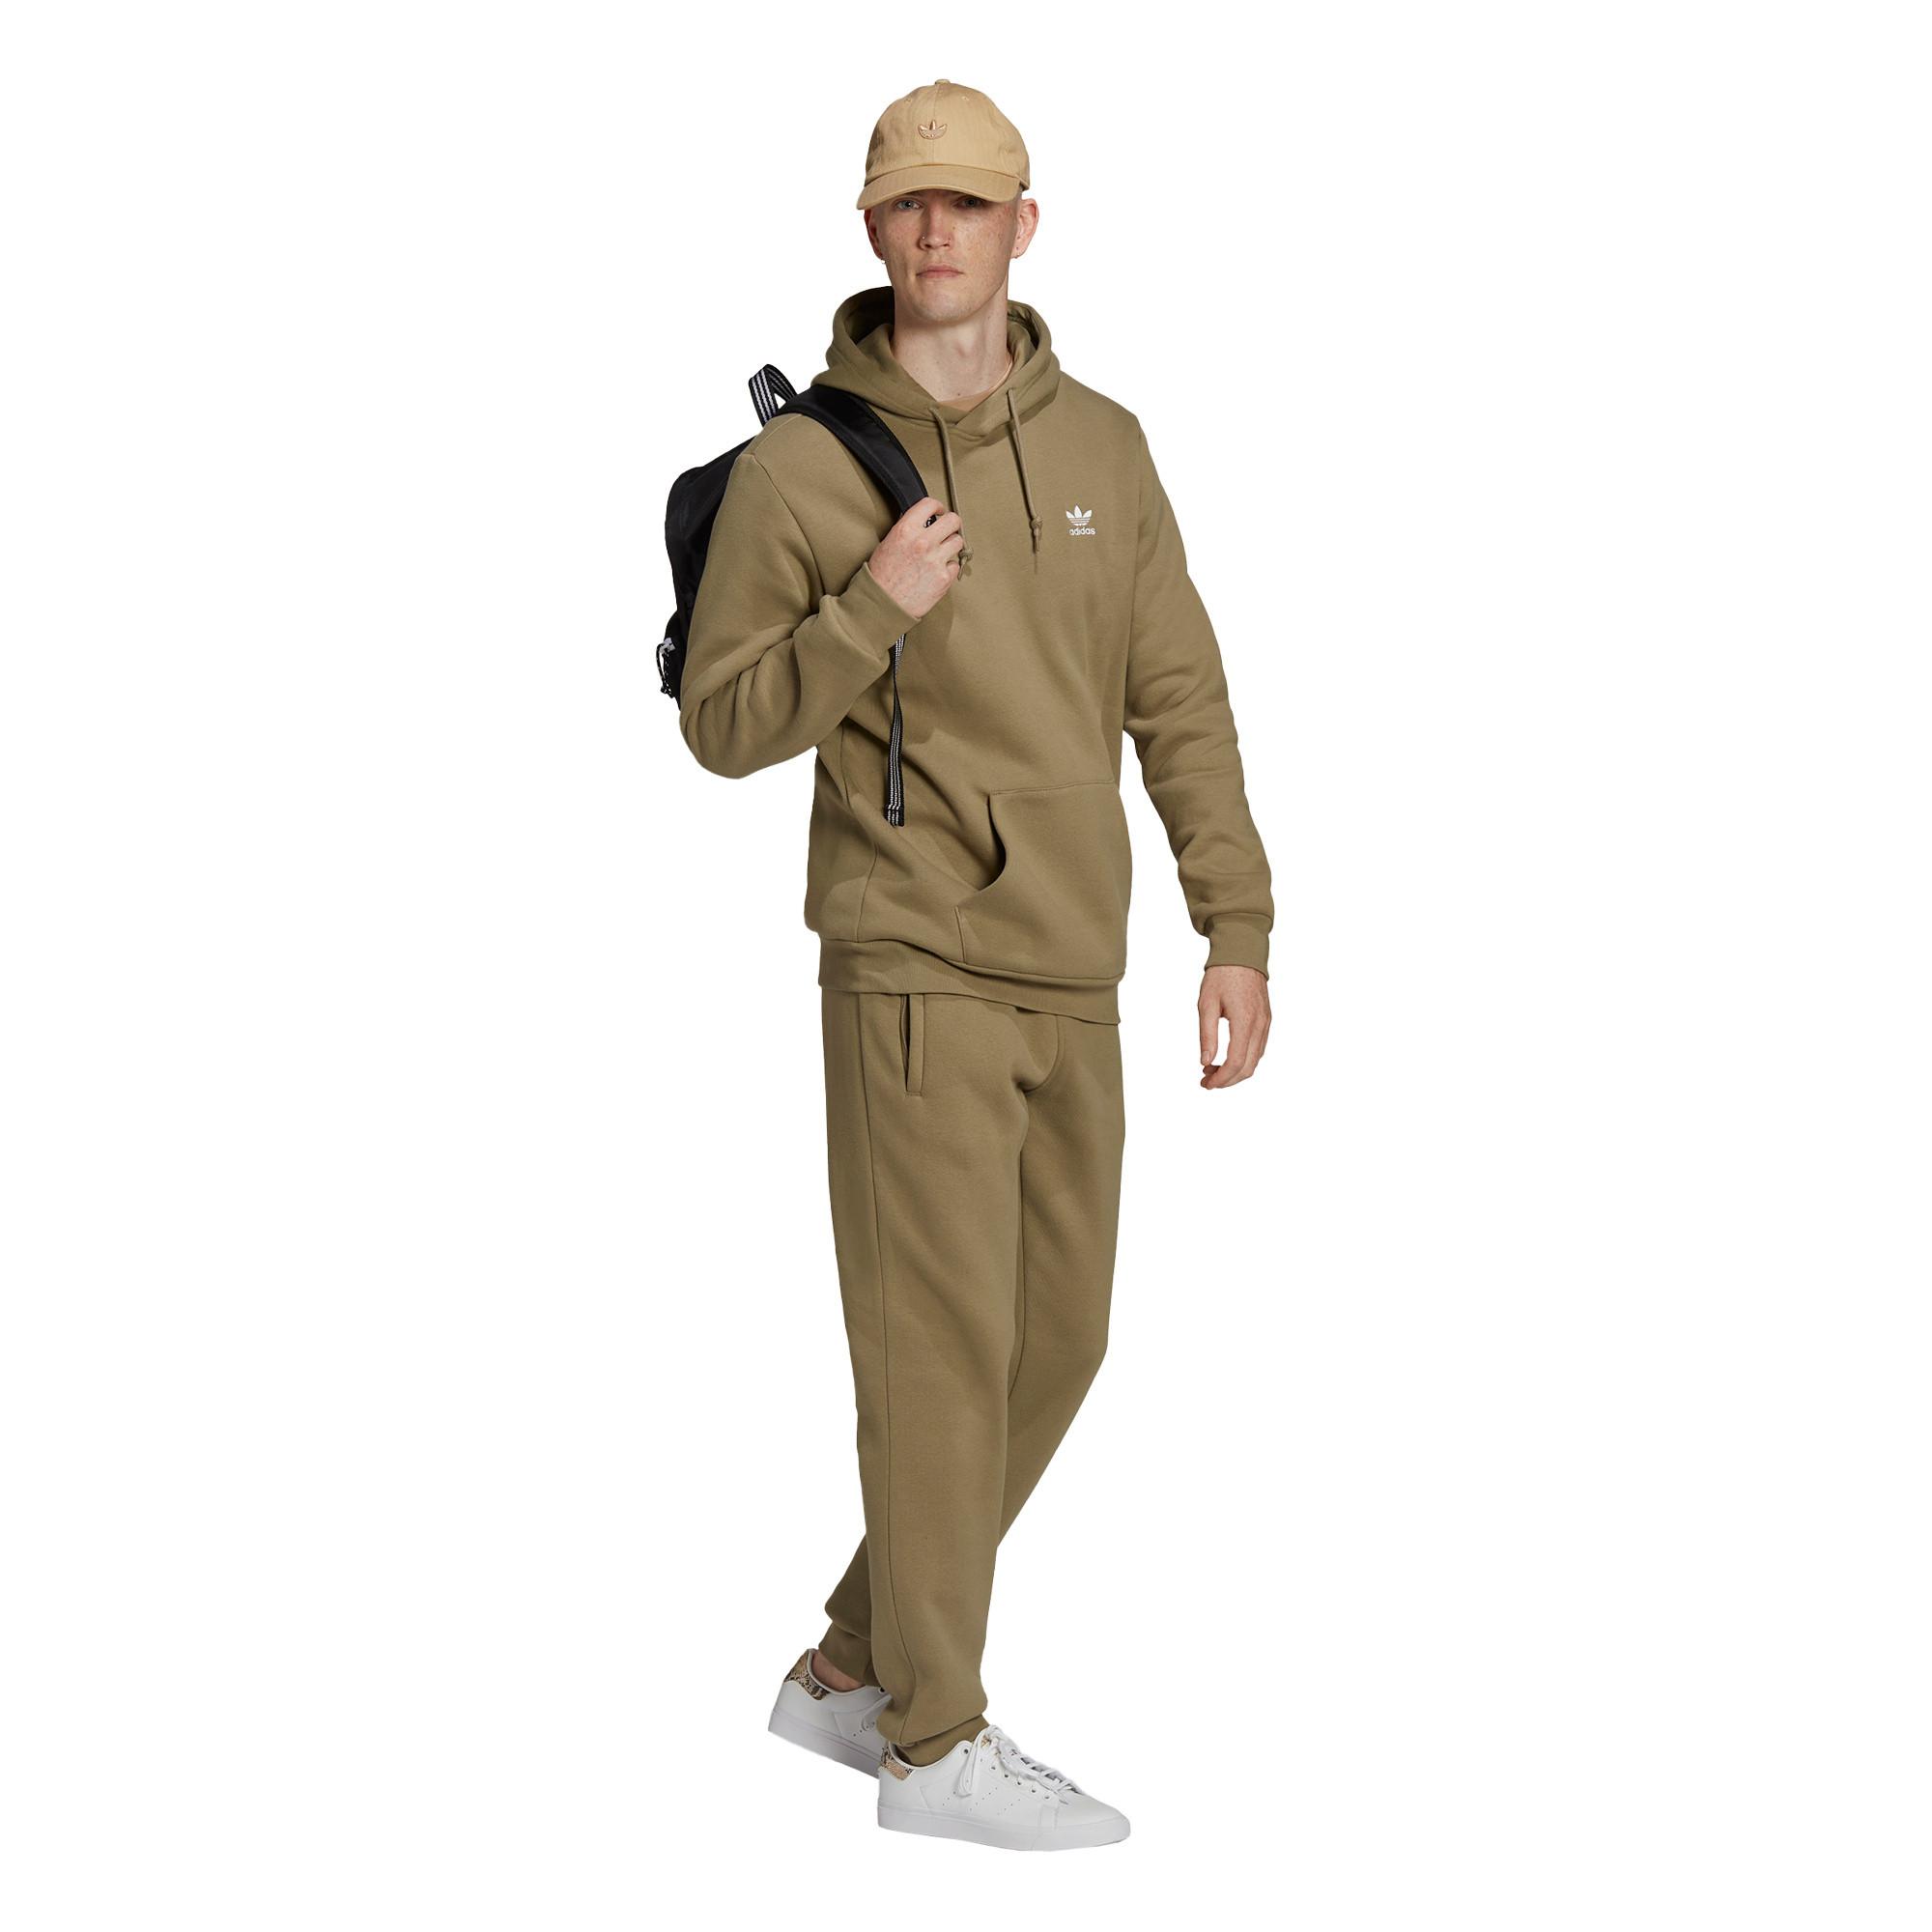 Pantaloni adicolor Essentials Trefoil, Verde, large image number 1